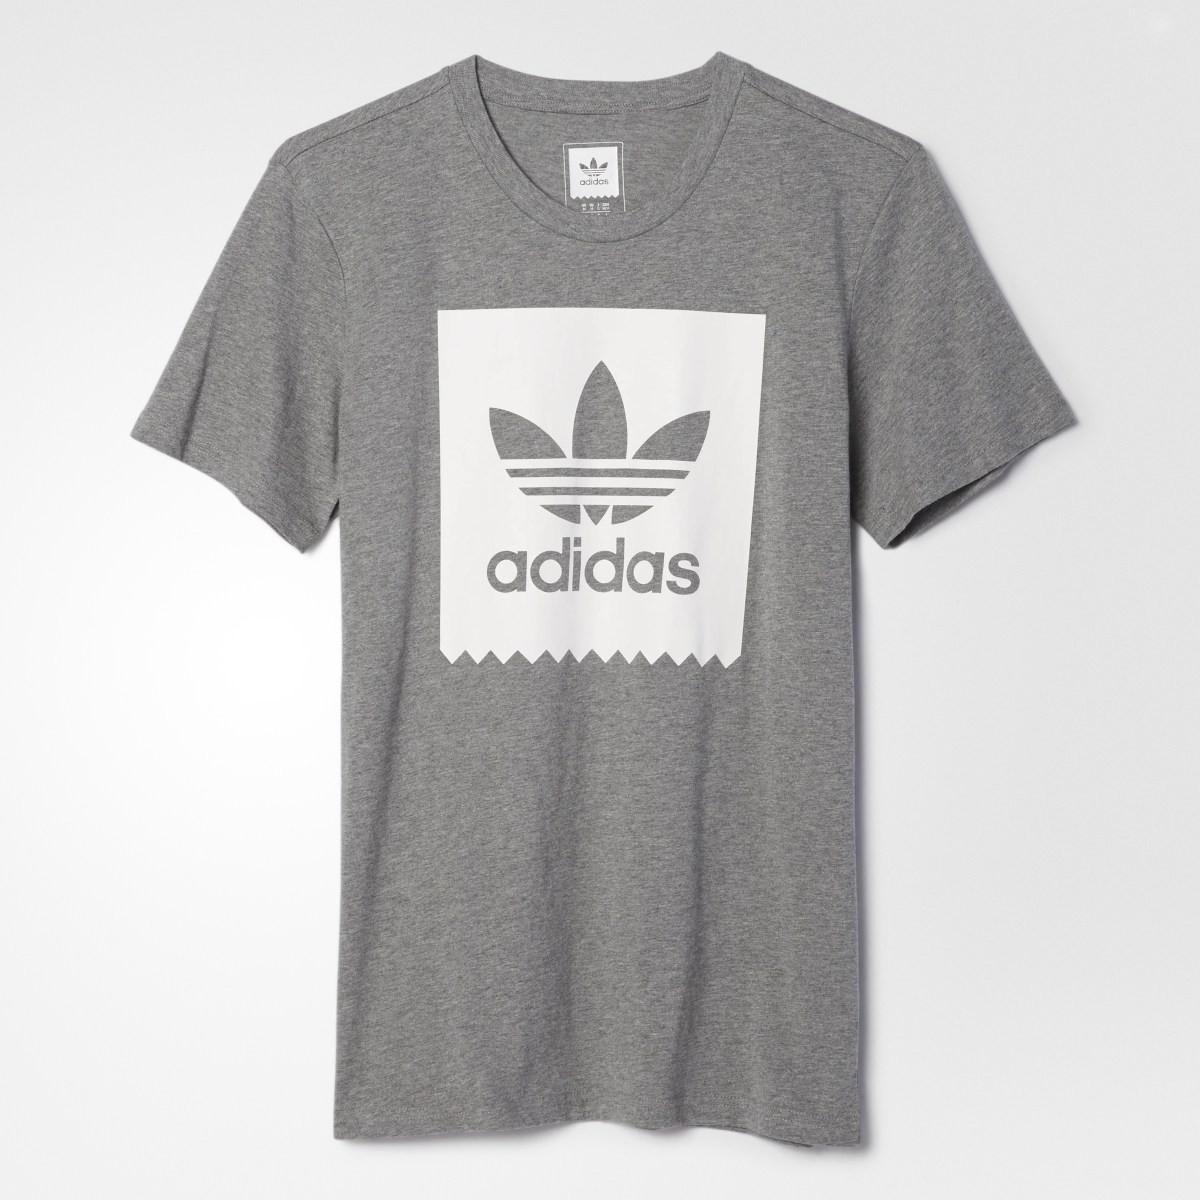 Pánské tričko adidas Originals BLKBRD LOGO FIL